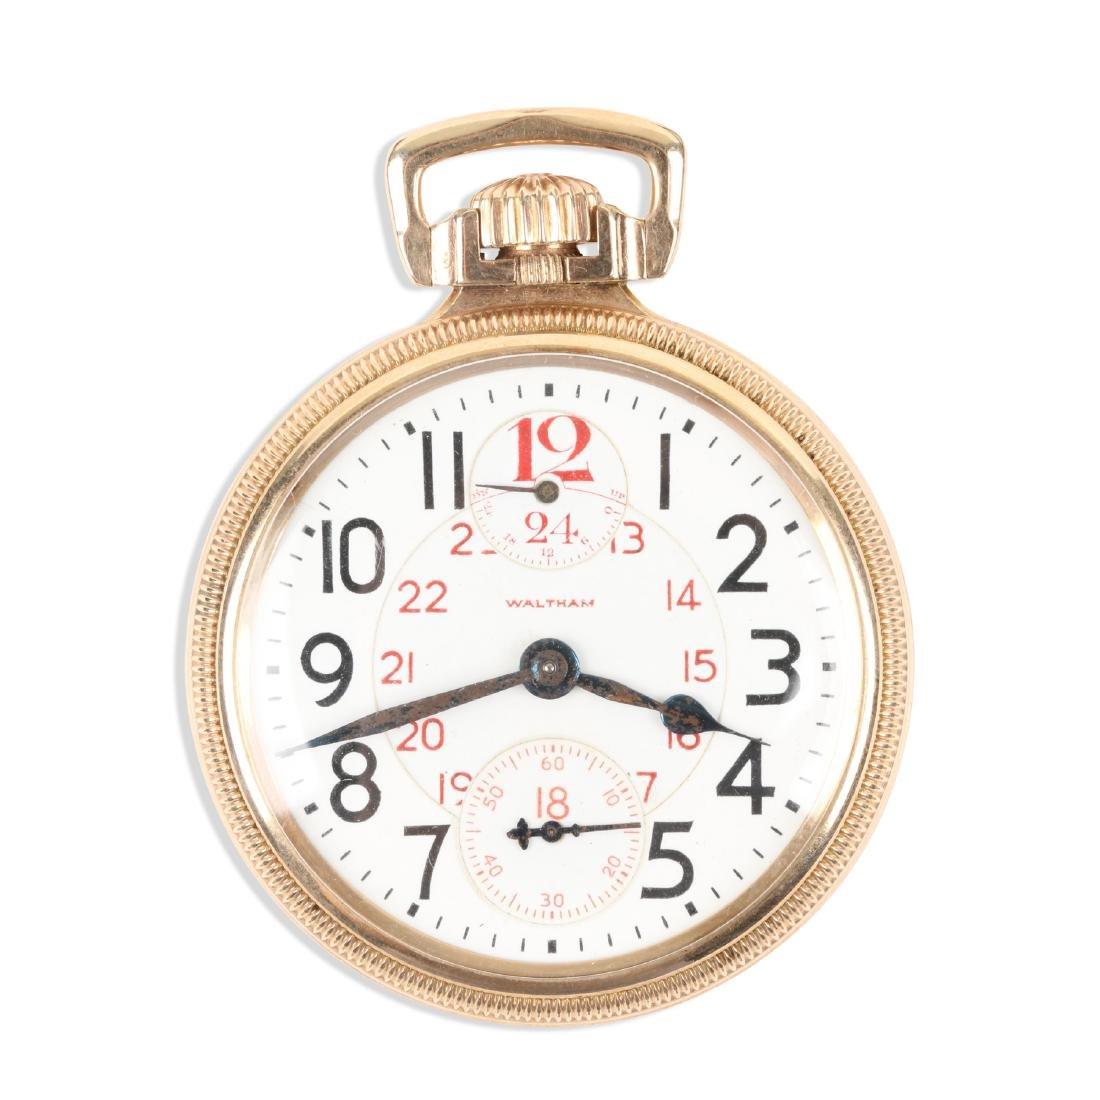 "Waltham, Vanguard ""Wind Indicator"" Pocket Watch"